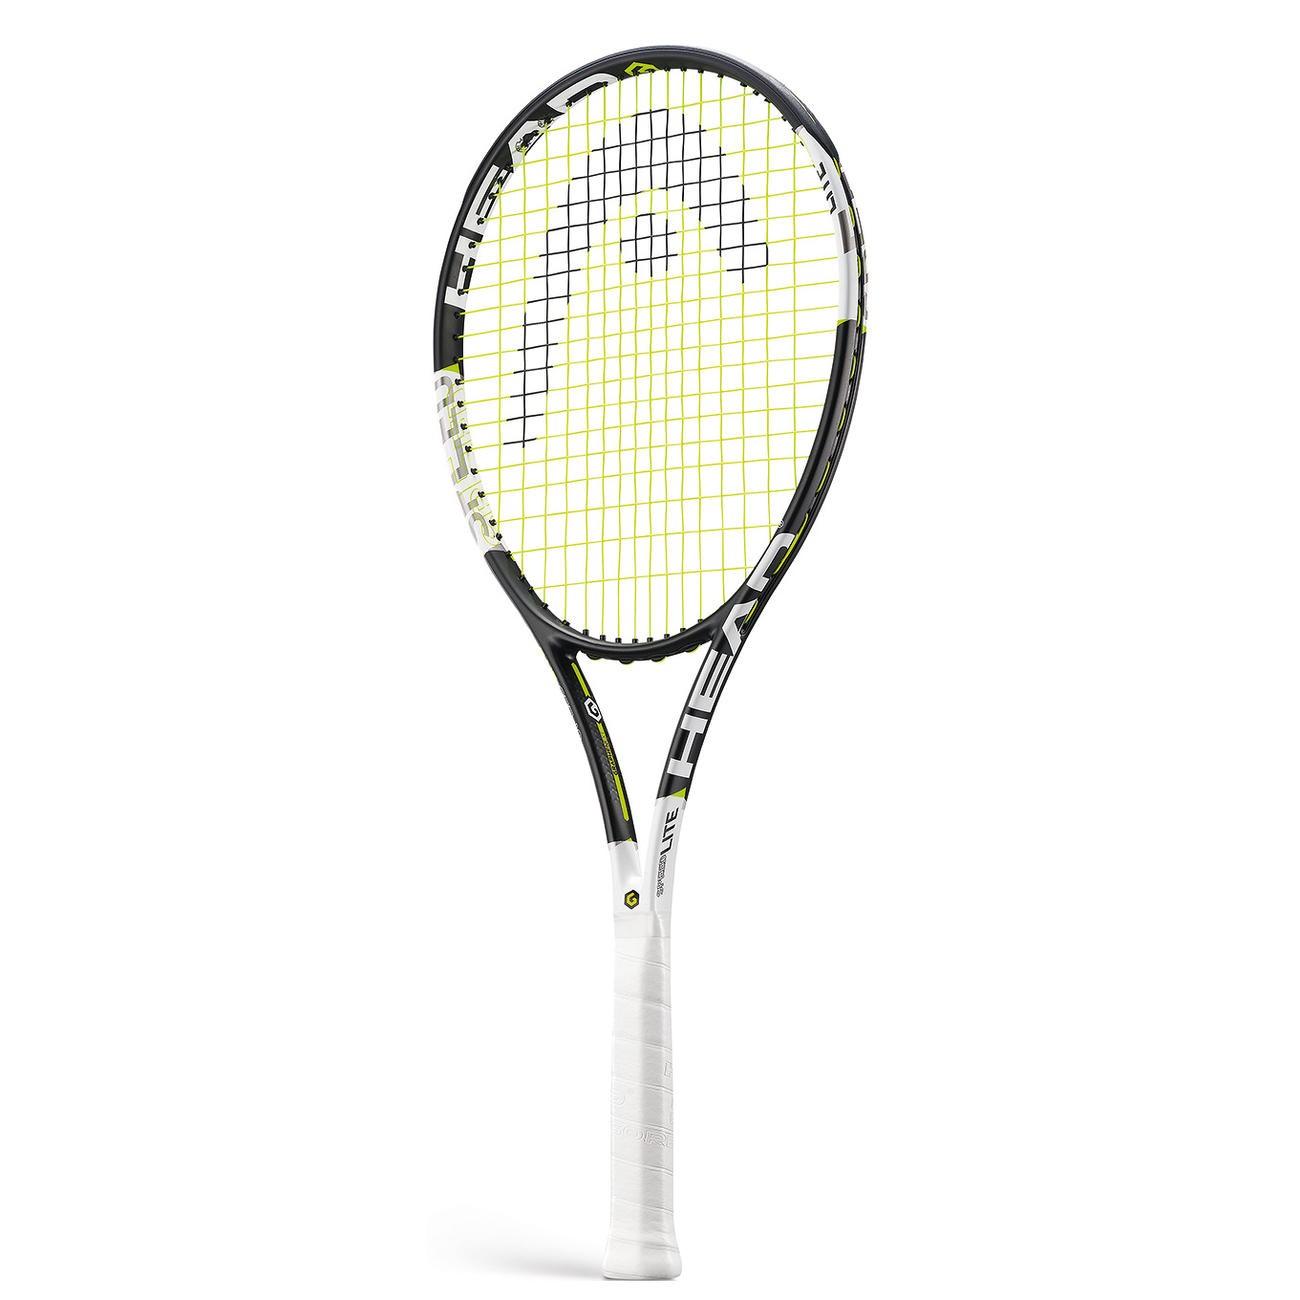 Rakieta tenisowa Head Graphene XT Speed Lite